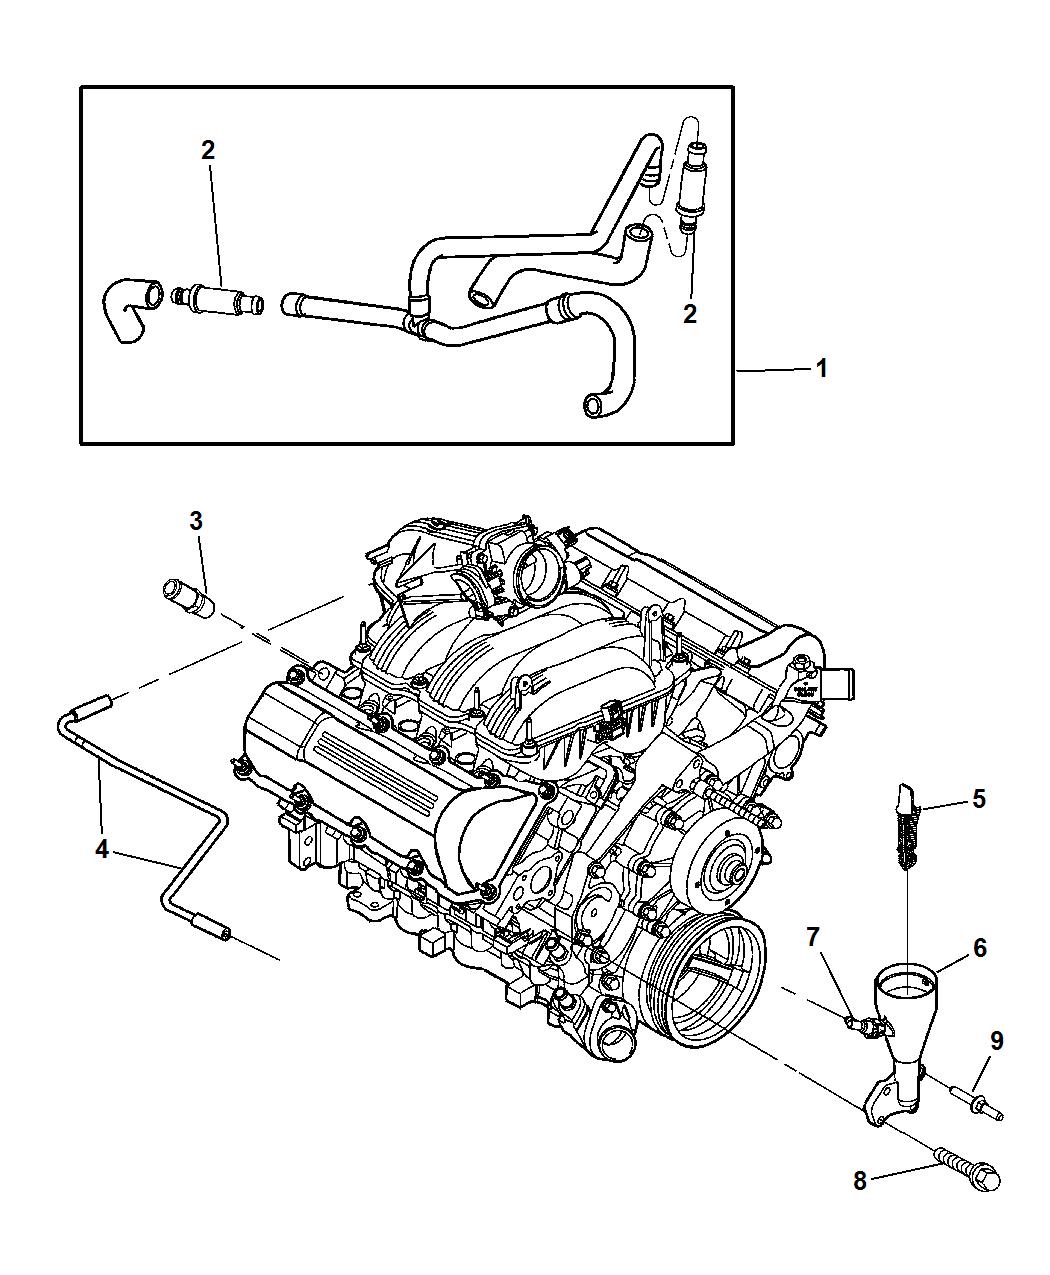 2005 Jeep Liberty Crd Engine Diagram - Eaton Atc 800 Wiring Diagram | Bege  Wiring Diagram | 2005 Jeep Liberty Crd Engine Diagram |  | Bege Wiring Diagram